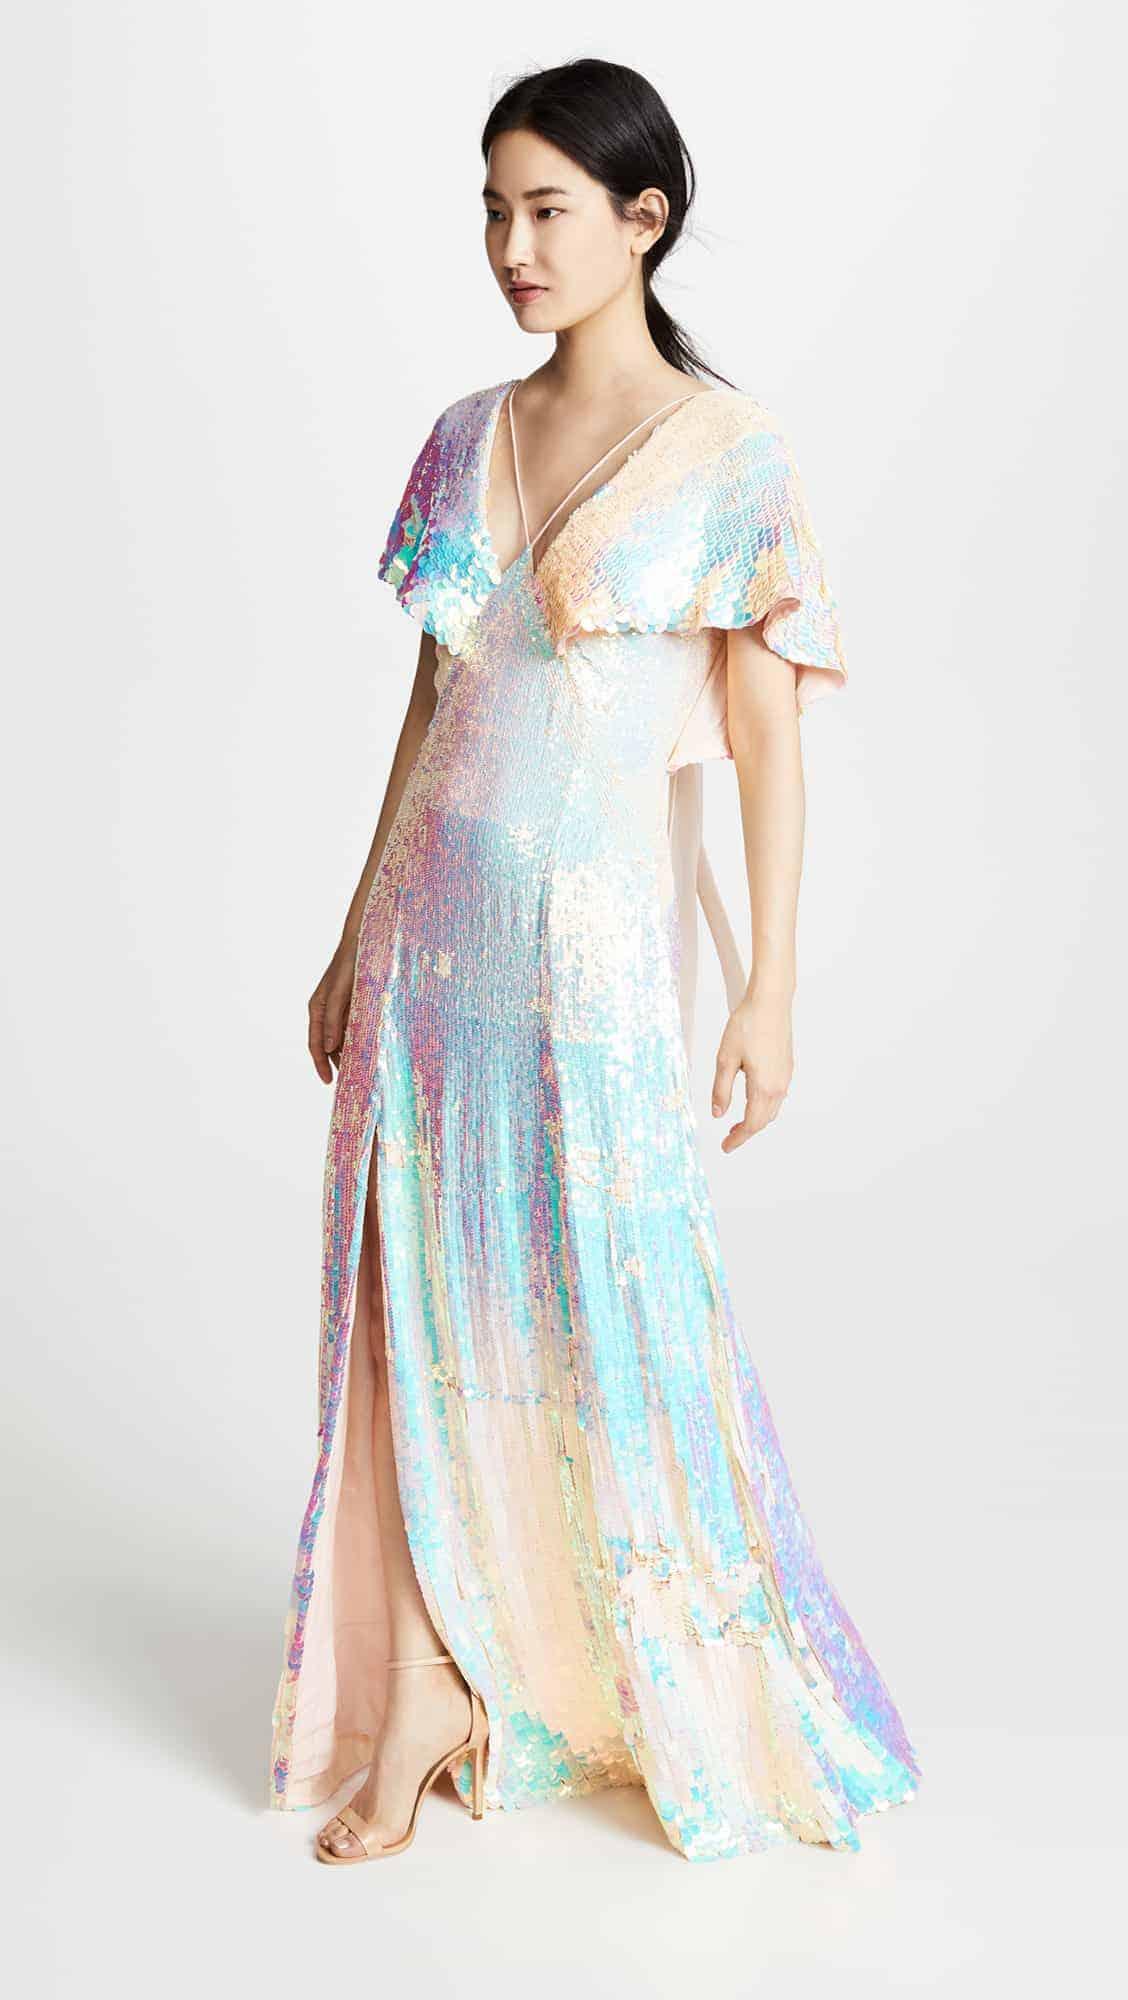 Temperley-bardot-sequin-galaxy-themed-wedding-dress